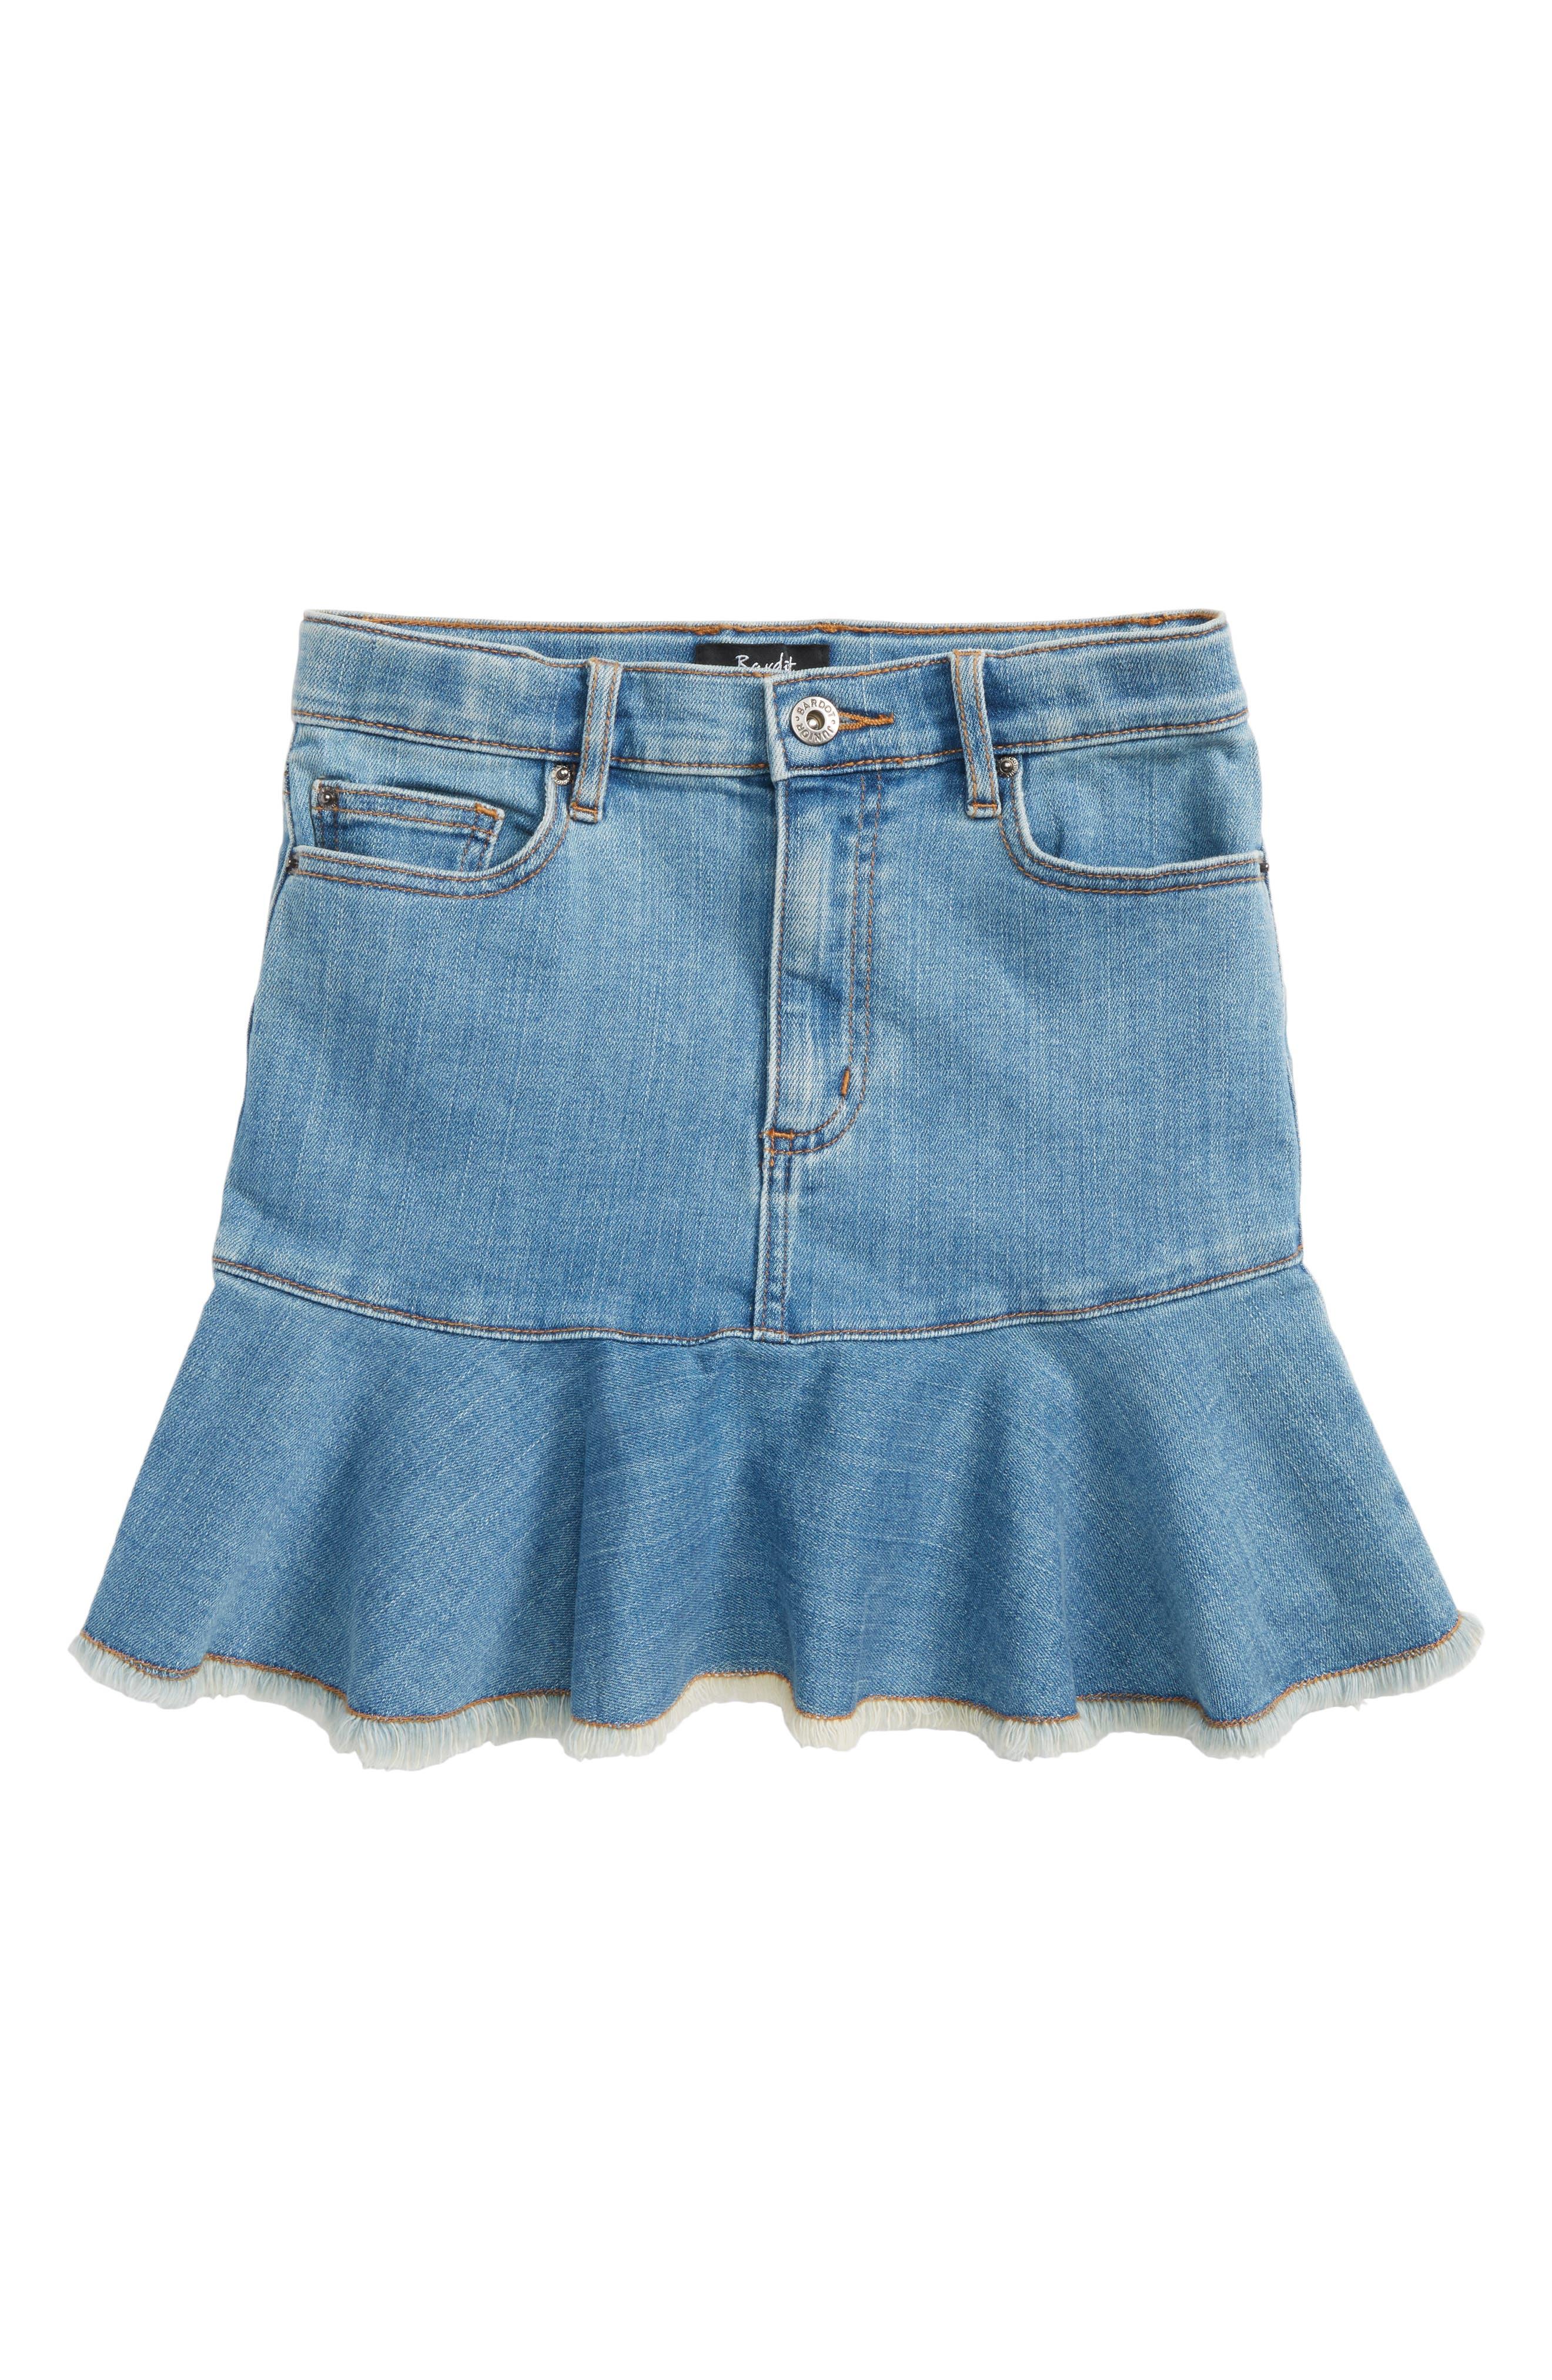 Mia Denim Skirt,                             Main thumbnail 1, color,                             Vintage Wash